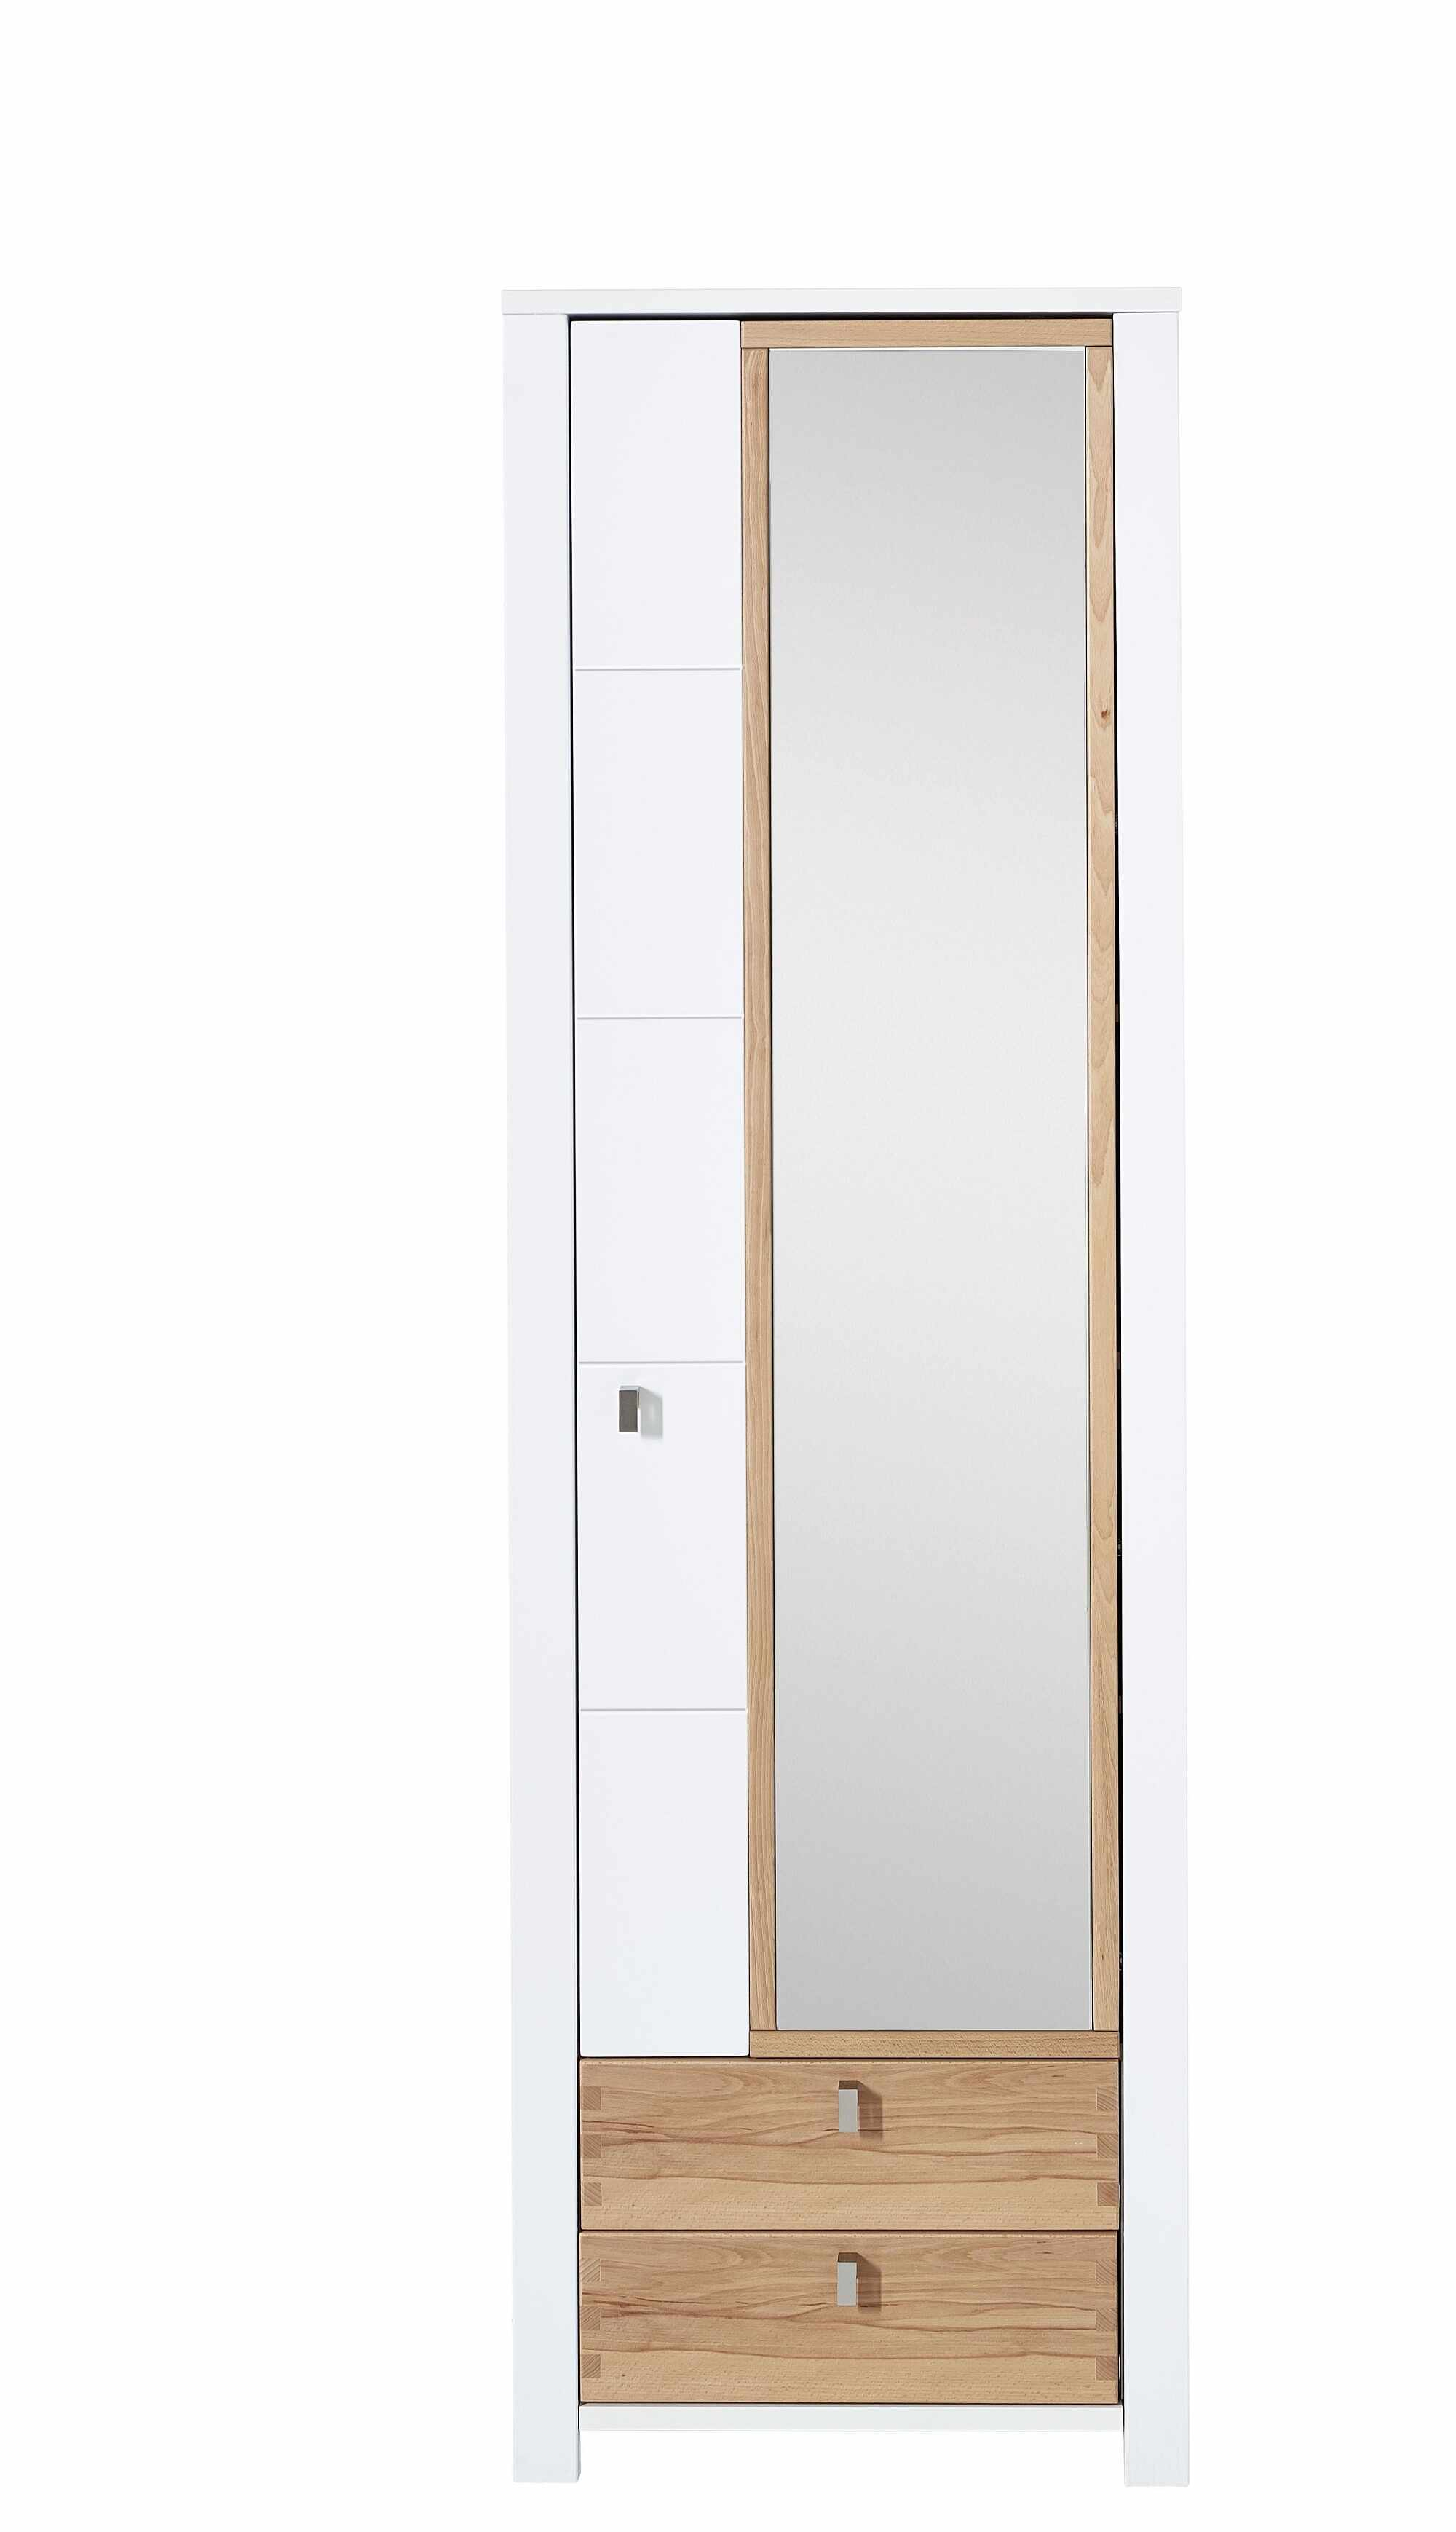 Dulap hol cu oglinda din pal si MDF cu 2 sertare si 1 usa, Selina Alb / Natur, l62xA41xH202 cm la pret 2277 lei